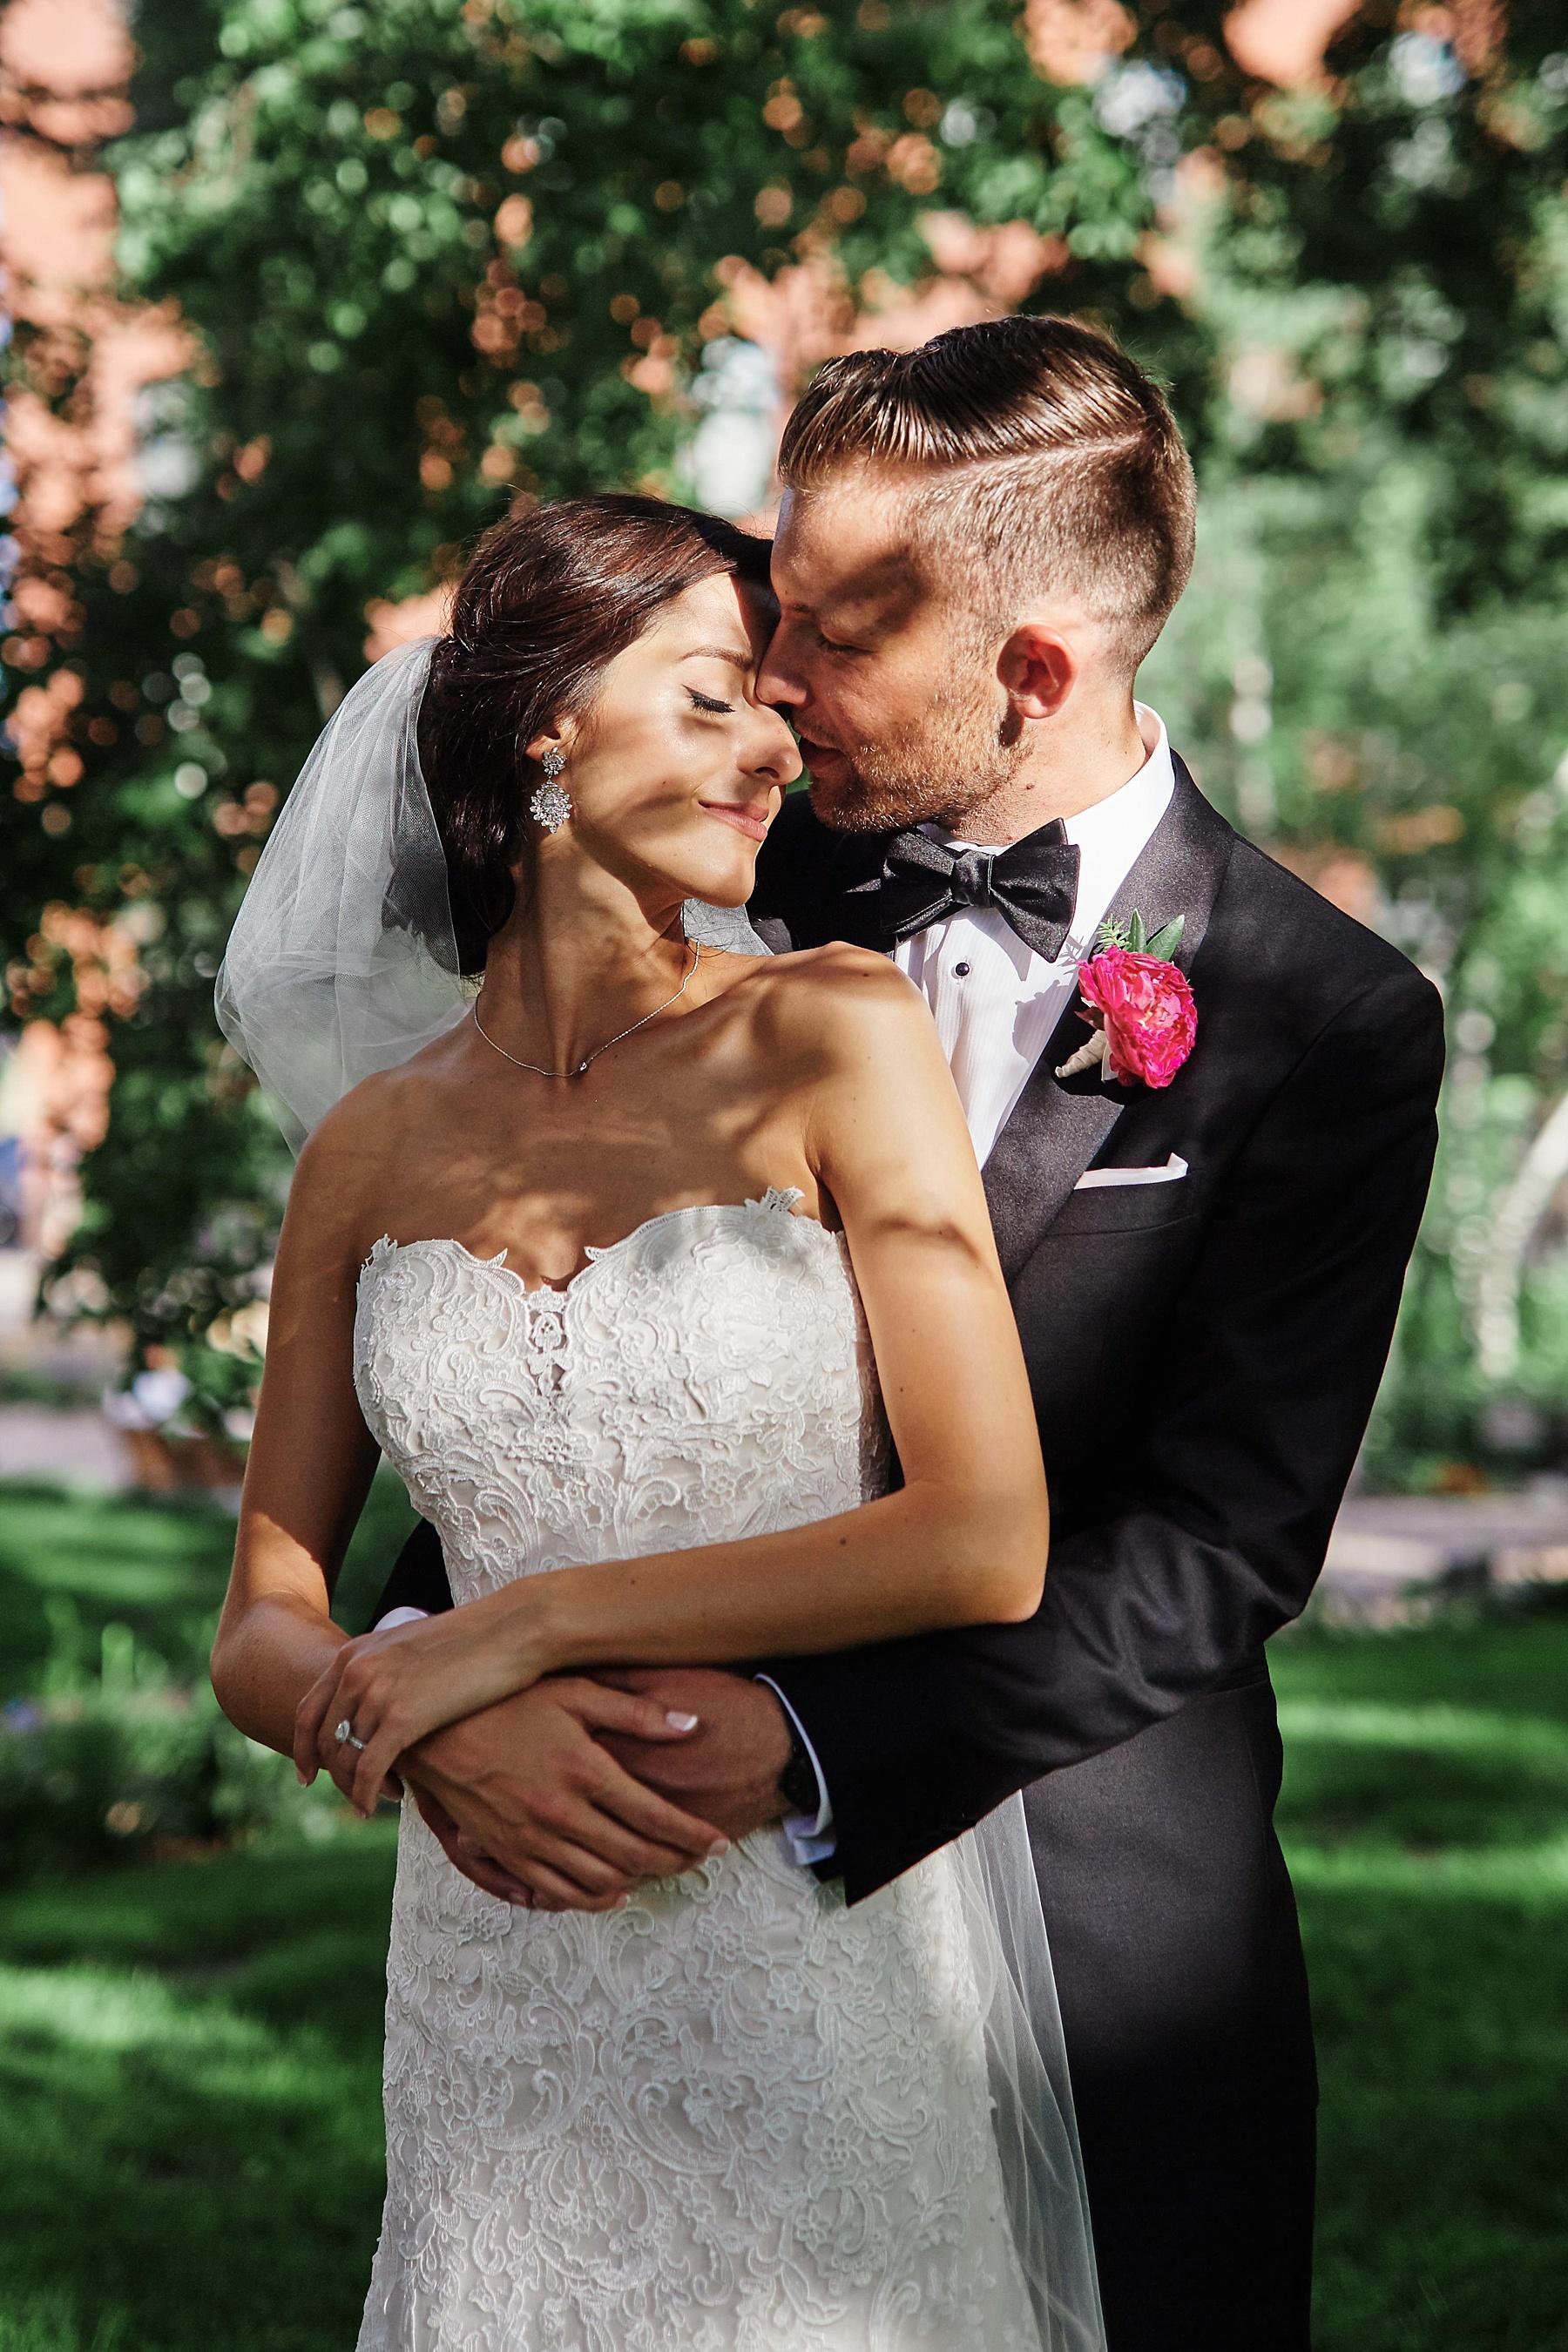 ABULAE-Wedding-Saint-paul-MN-Josh-Sofia-Wedding-Mears-Park_0800.jpg